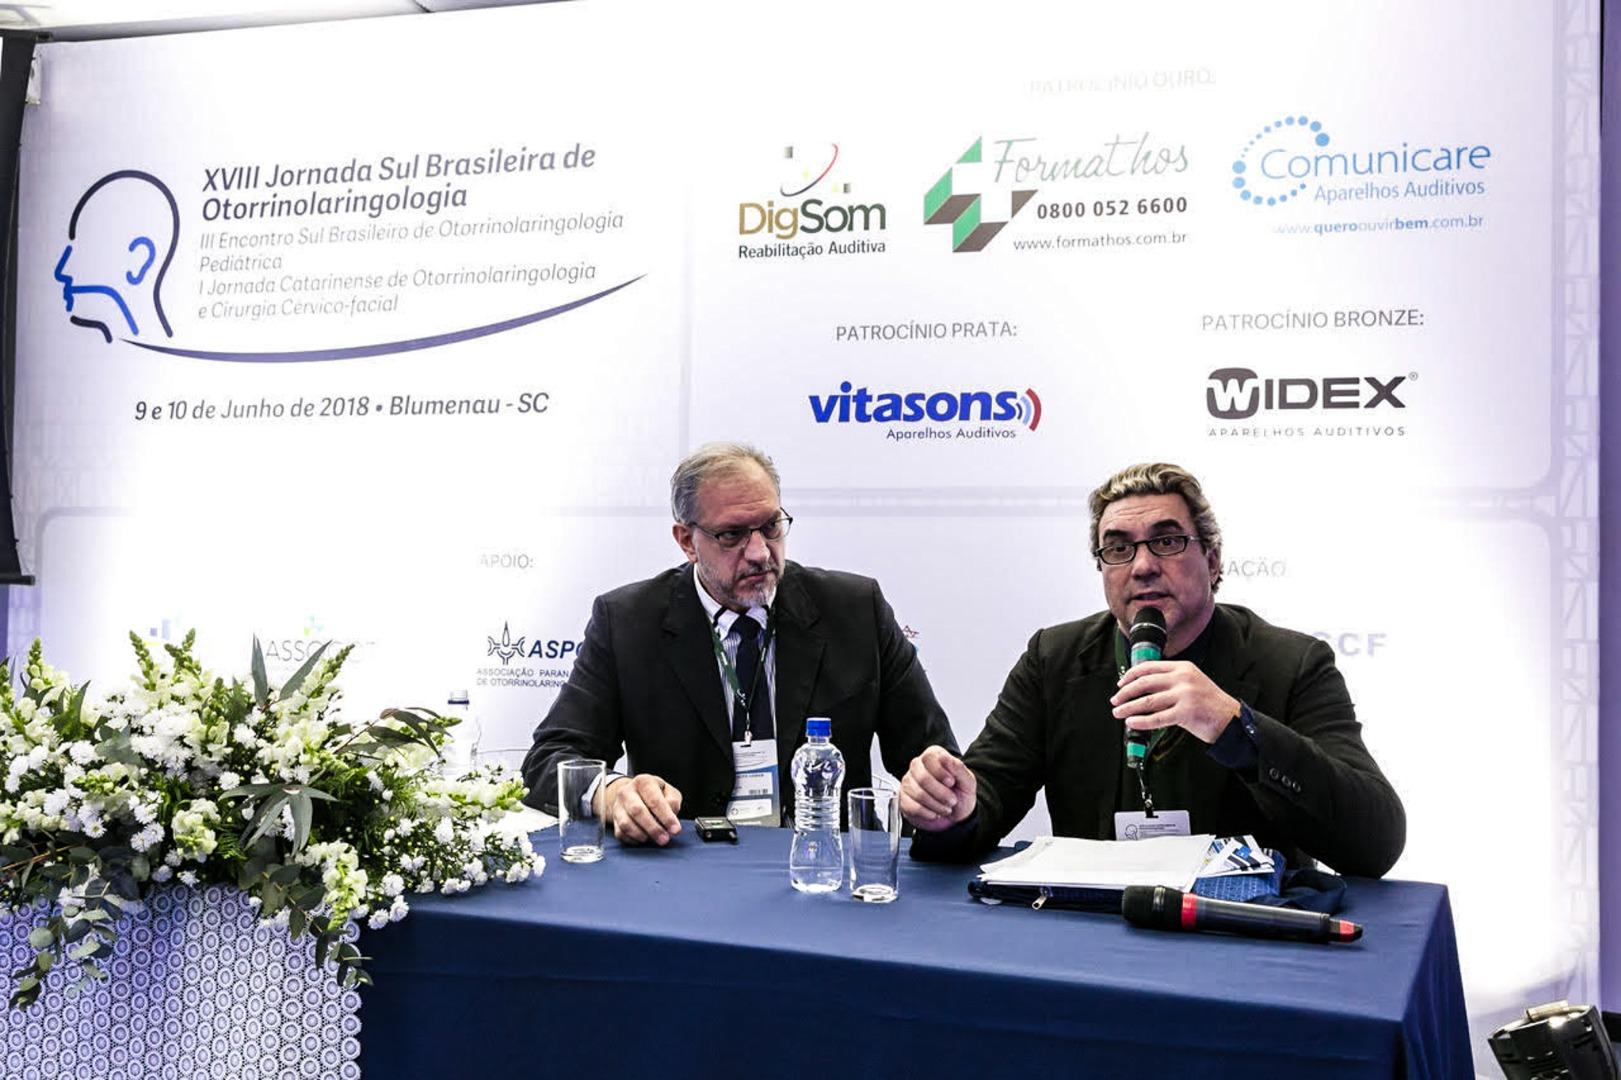 Profissional do município ministra palestra na 18ª Jornada Sul Brasileira Otorrinolaringologia